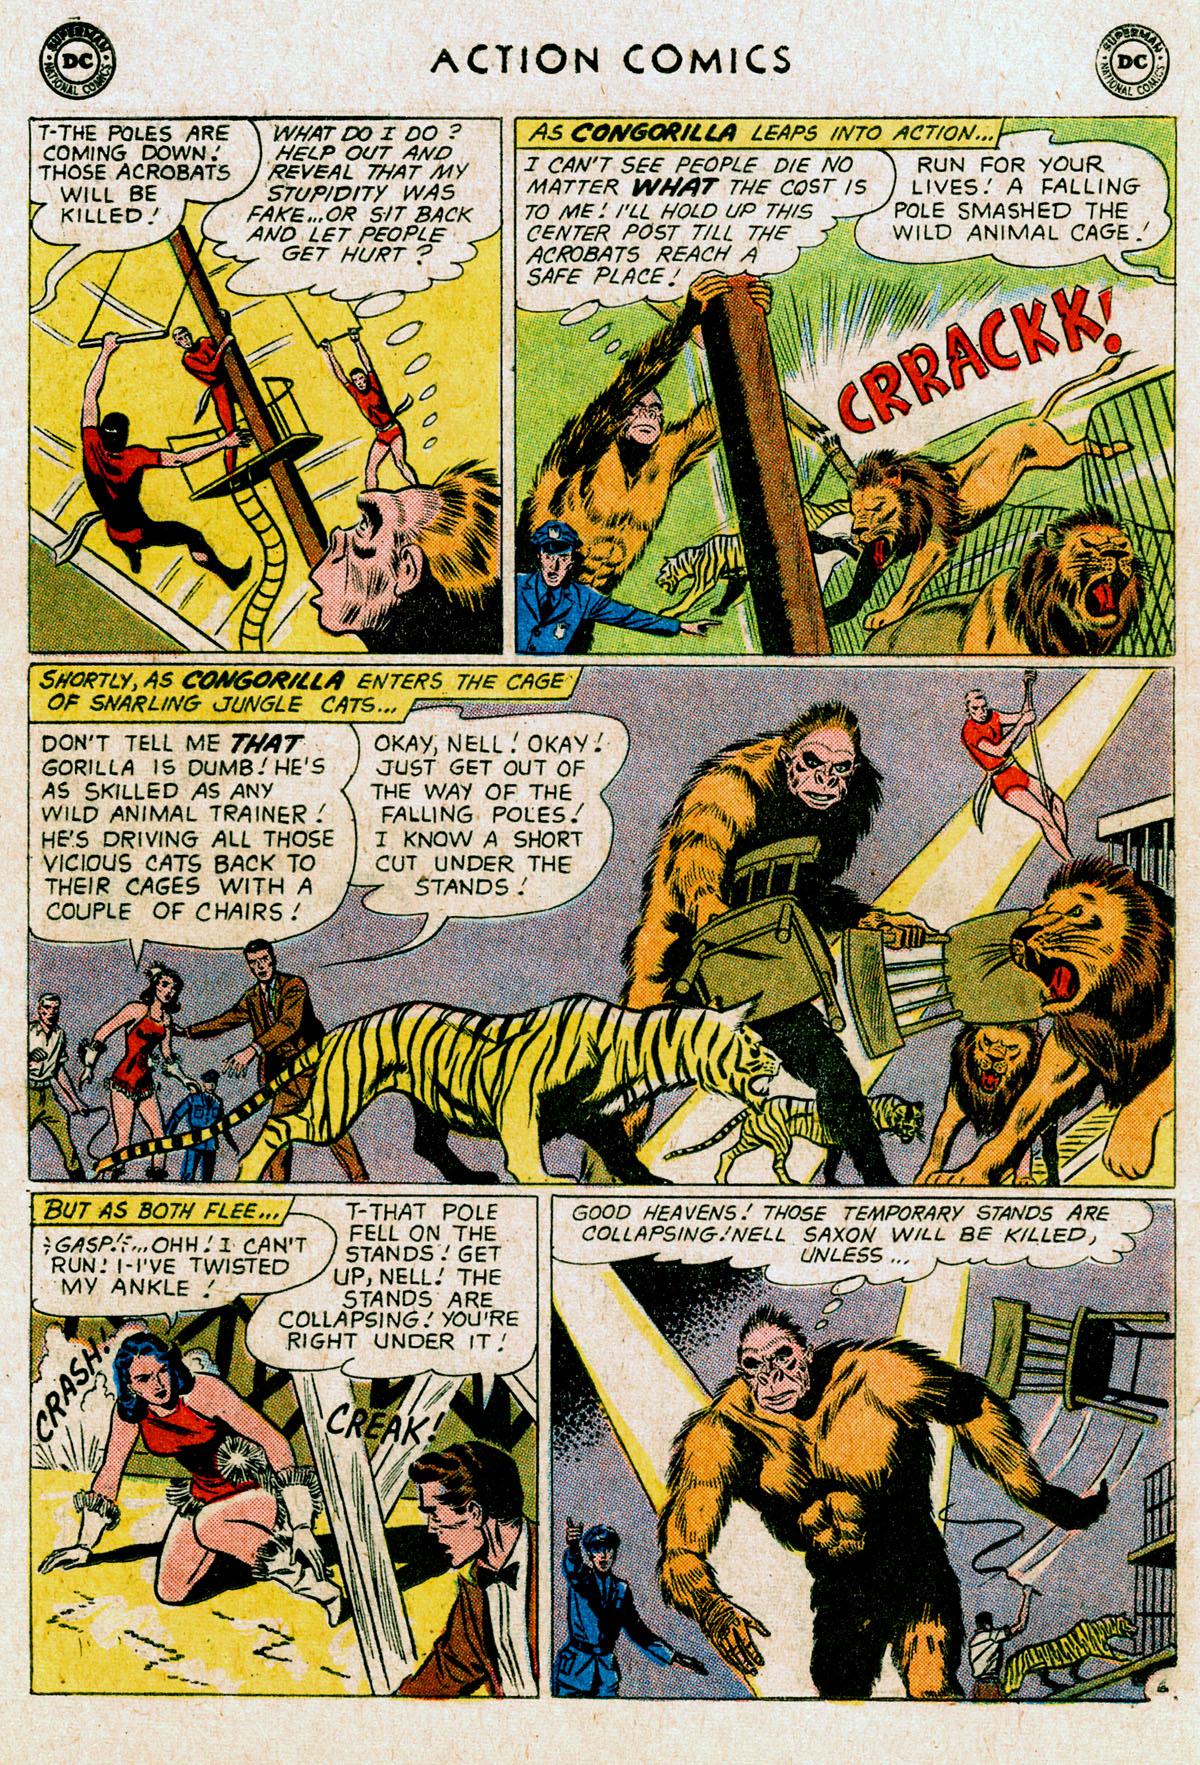 Action Comics (1938) 259 Page 21